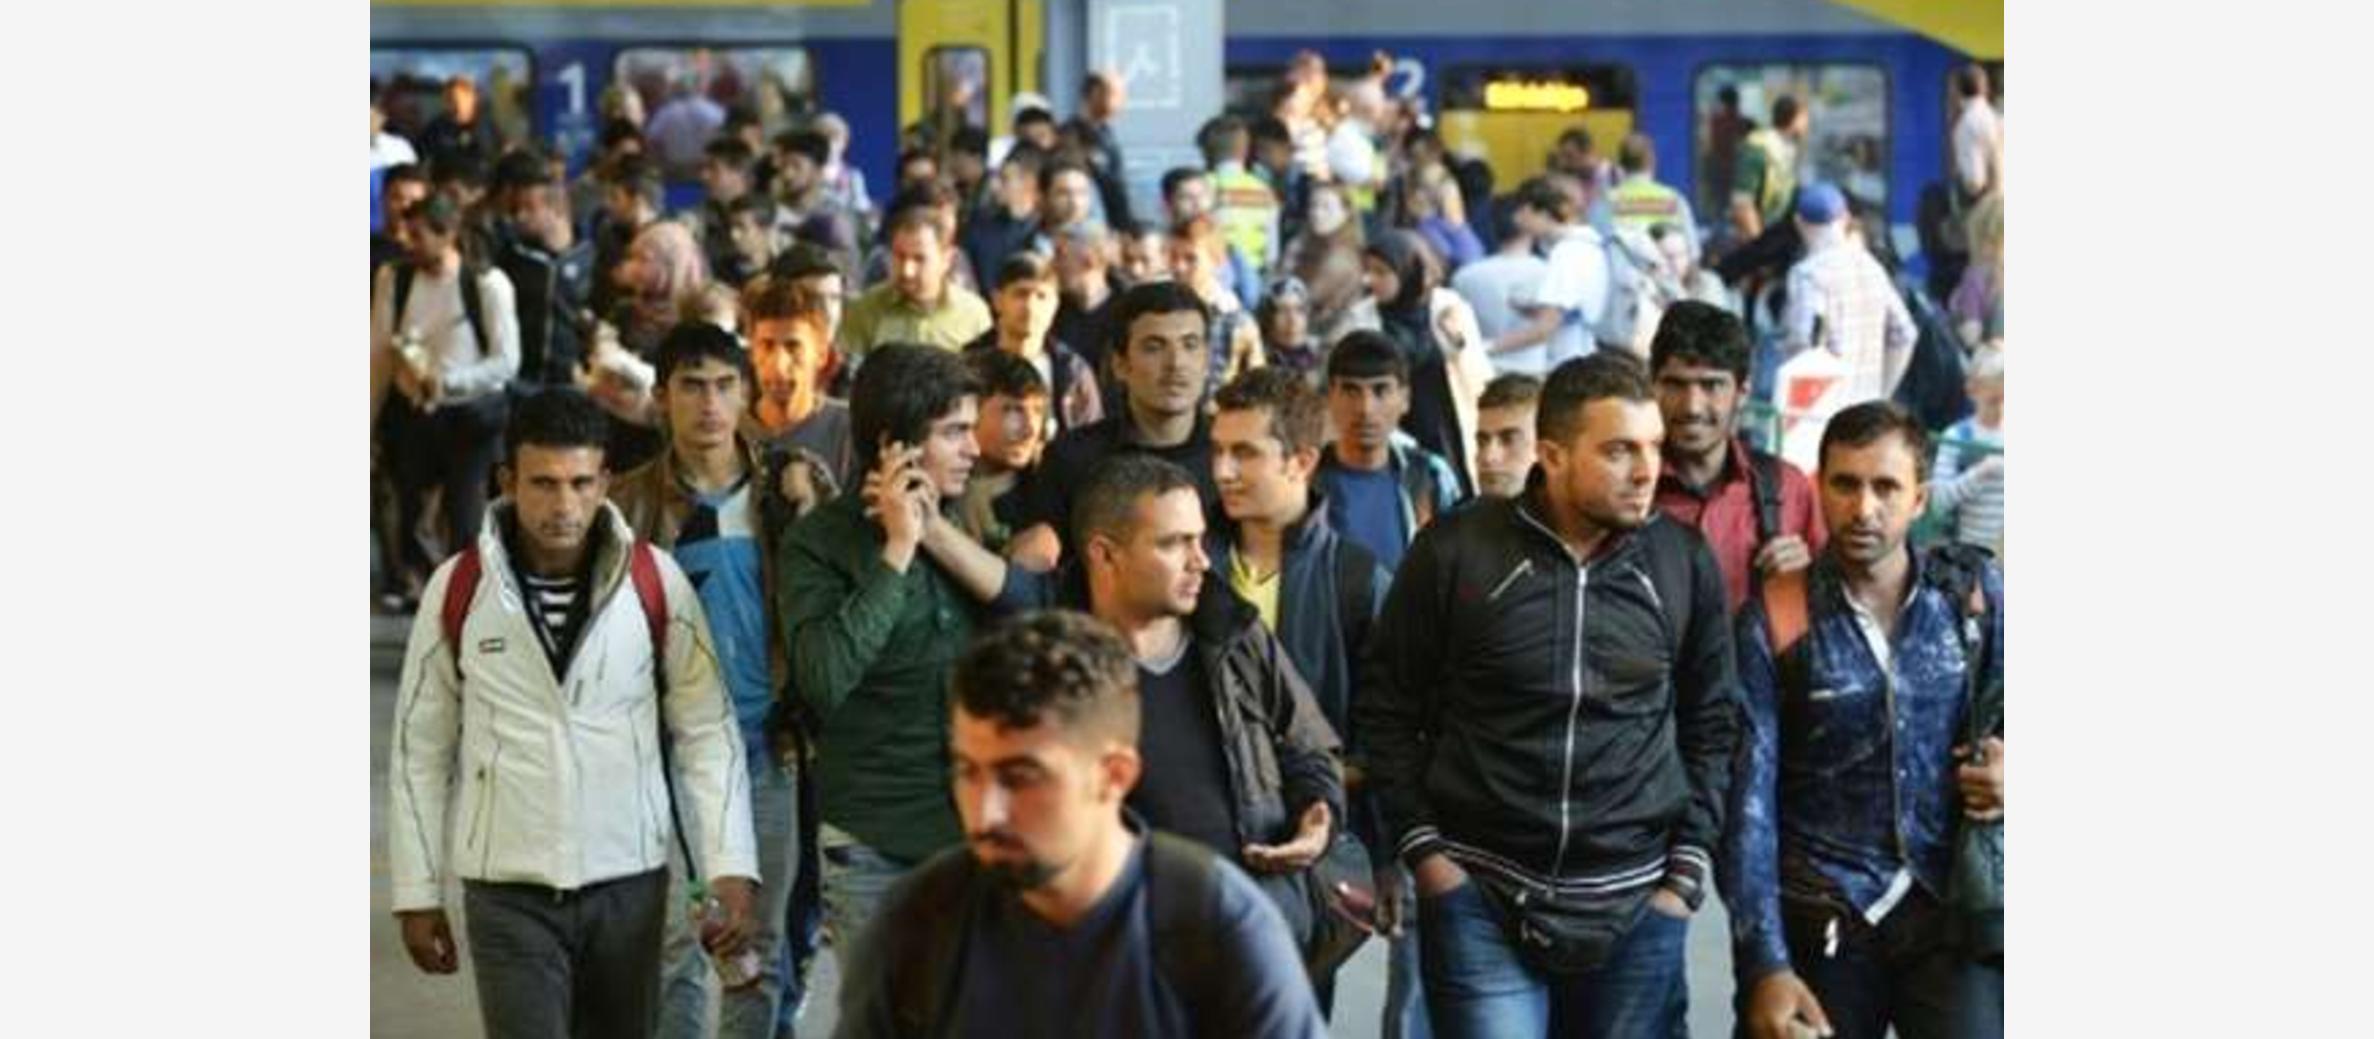 German Intelligence warns over migrant anti-Semitism